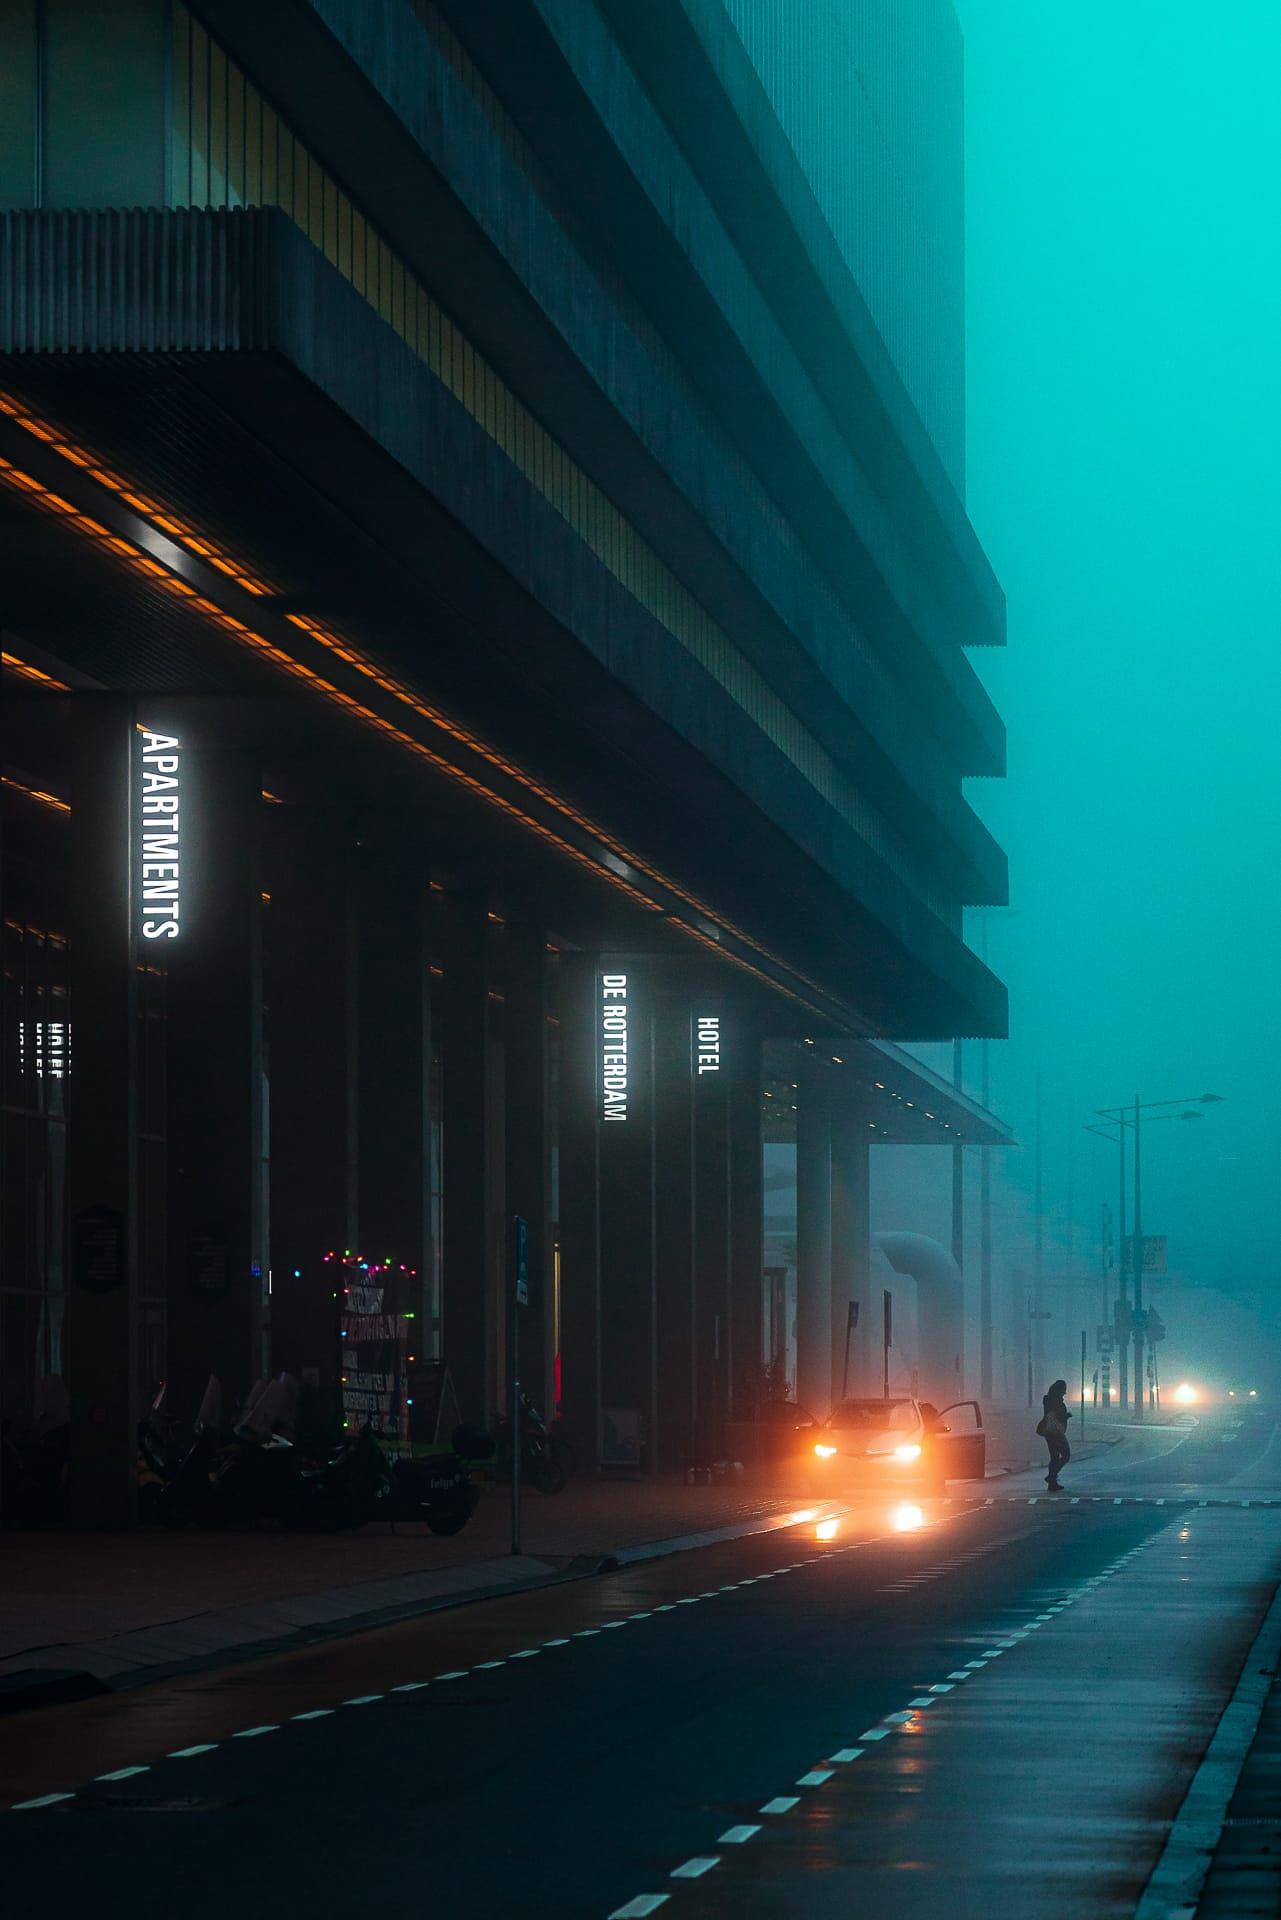 Street Cinema 5